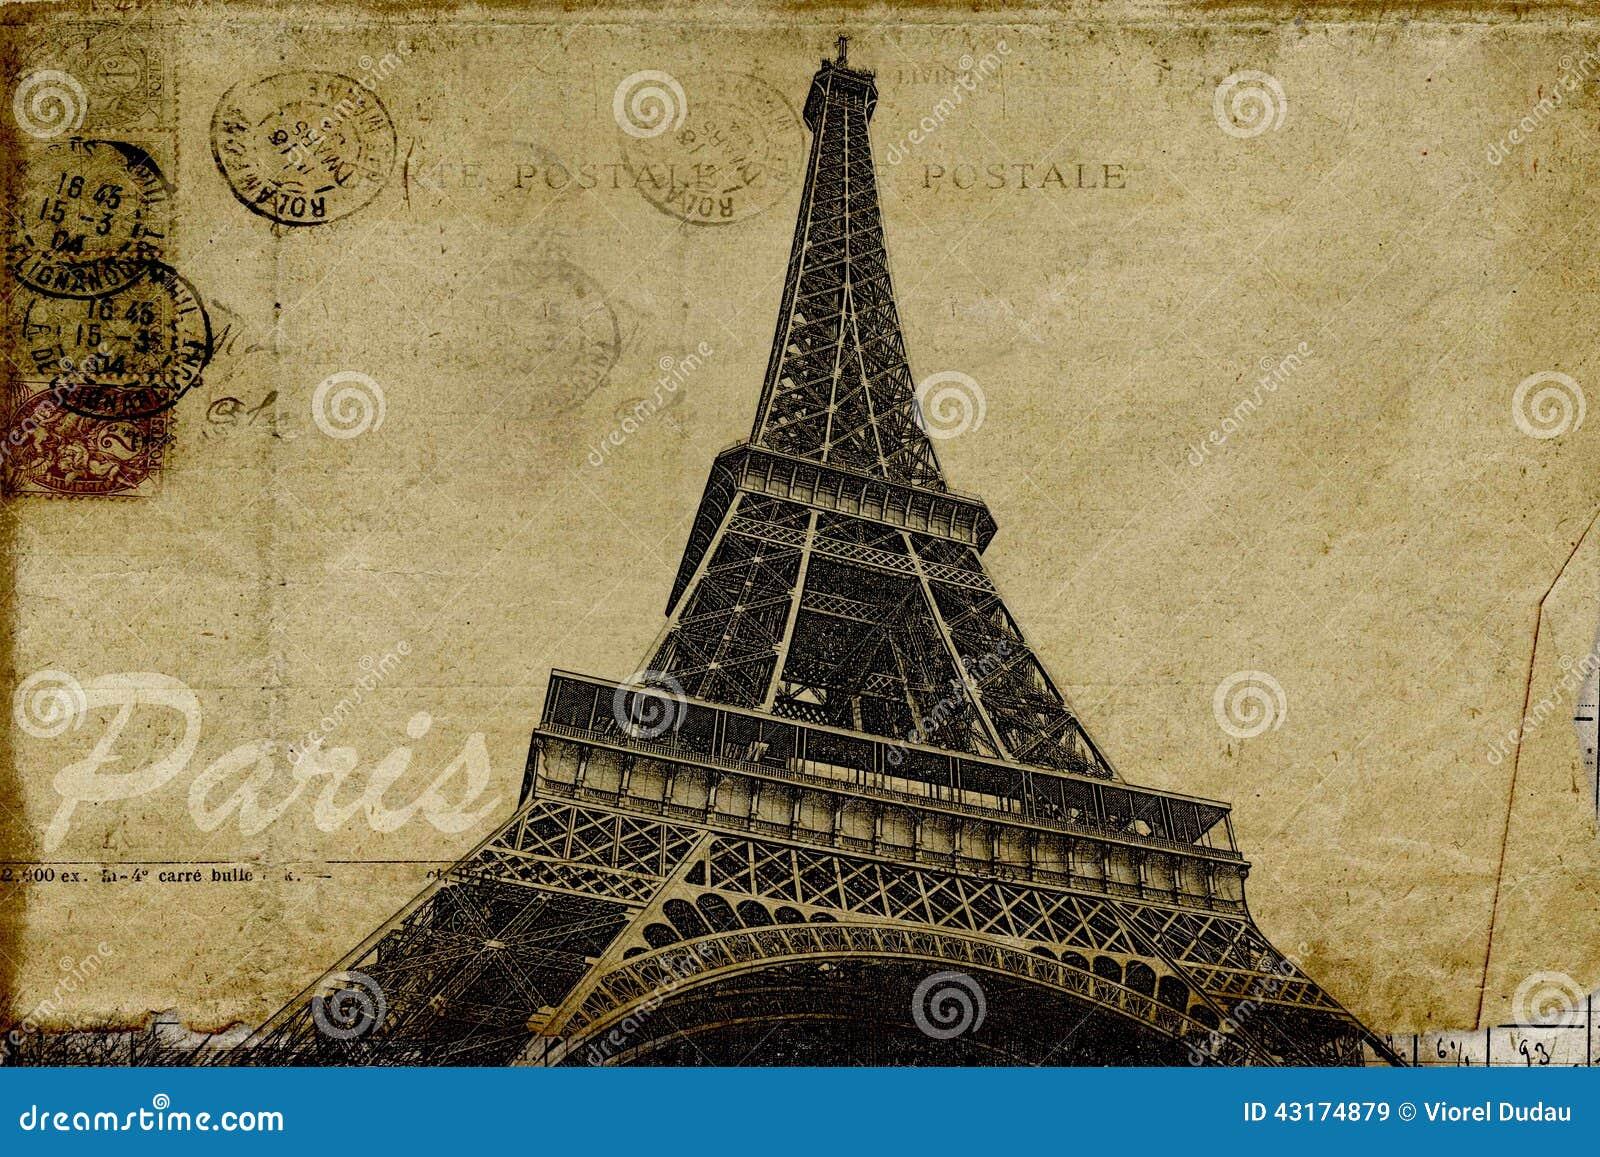 Paris Postcard Stock Illustration Image Of Eiffel Card